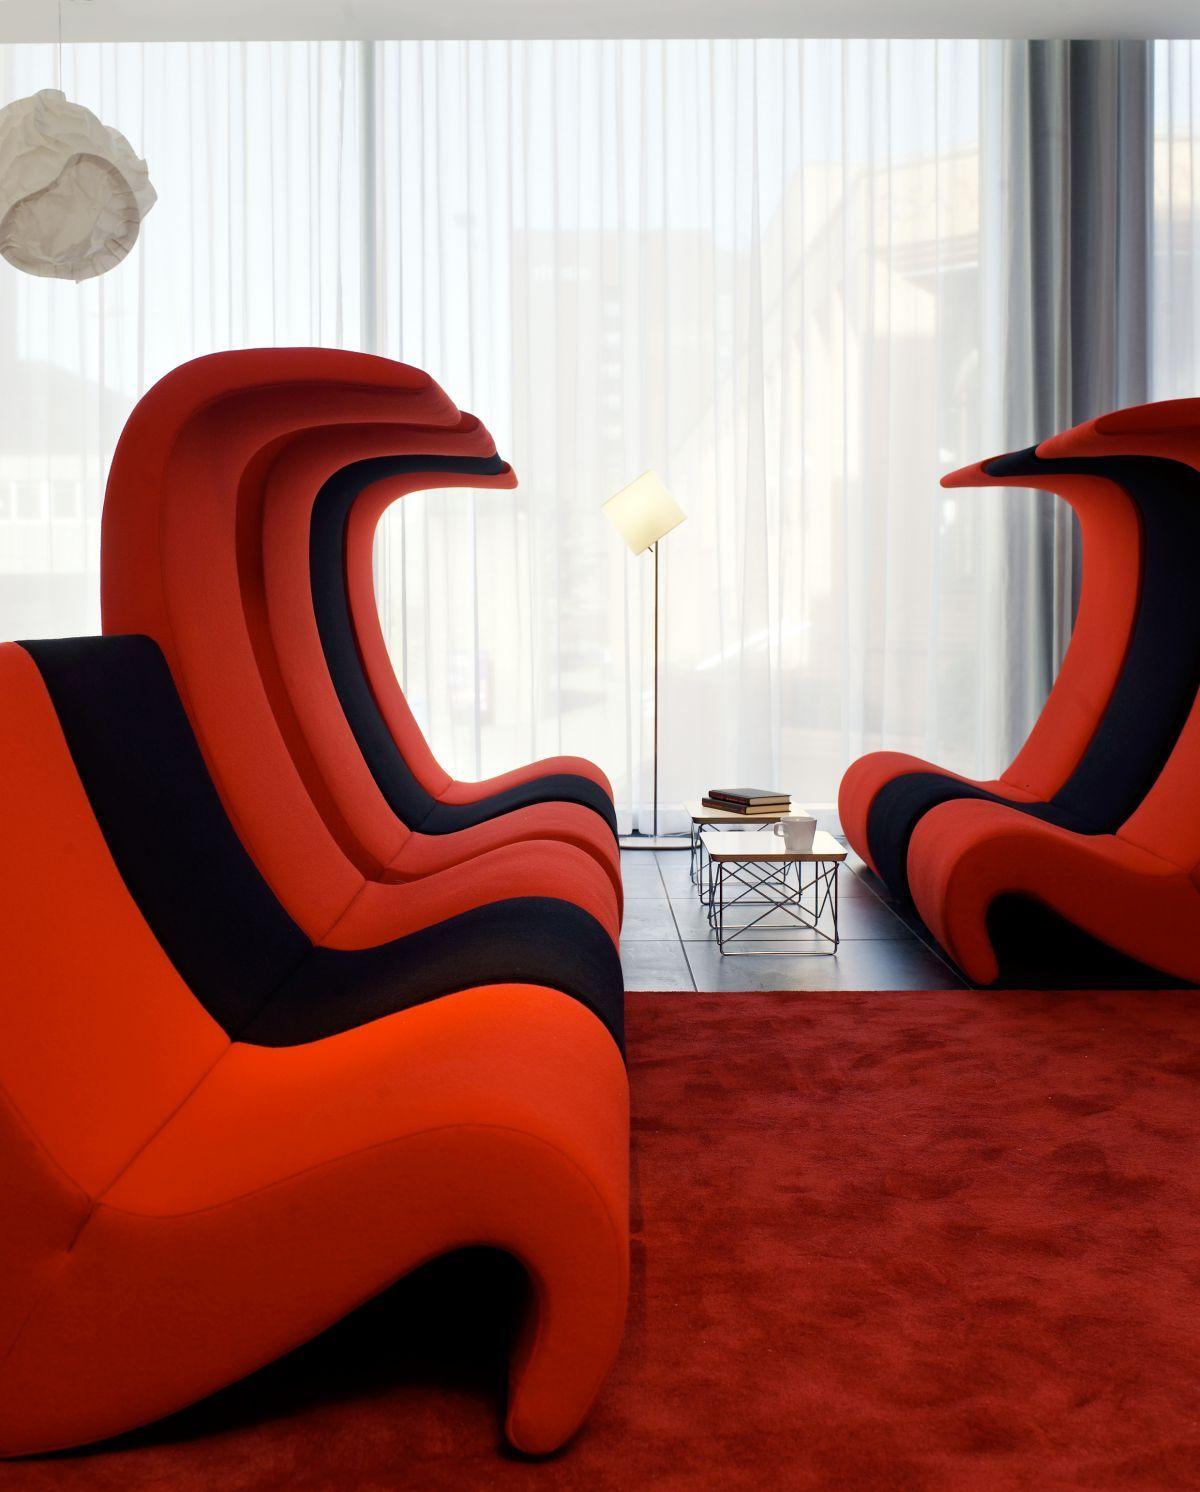 Citizenm glasgow hotel by concrete architectural associates